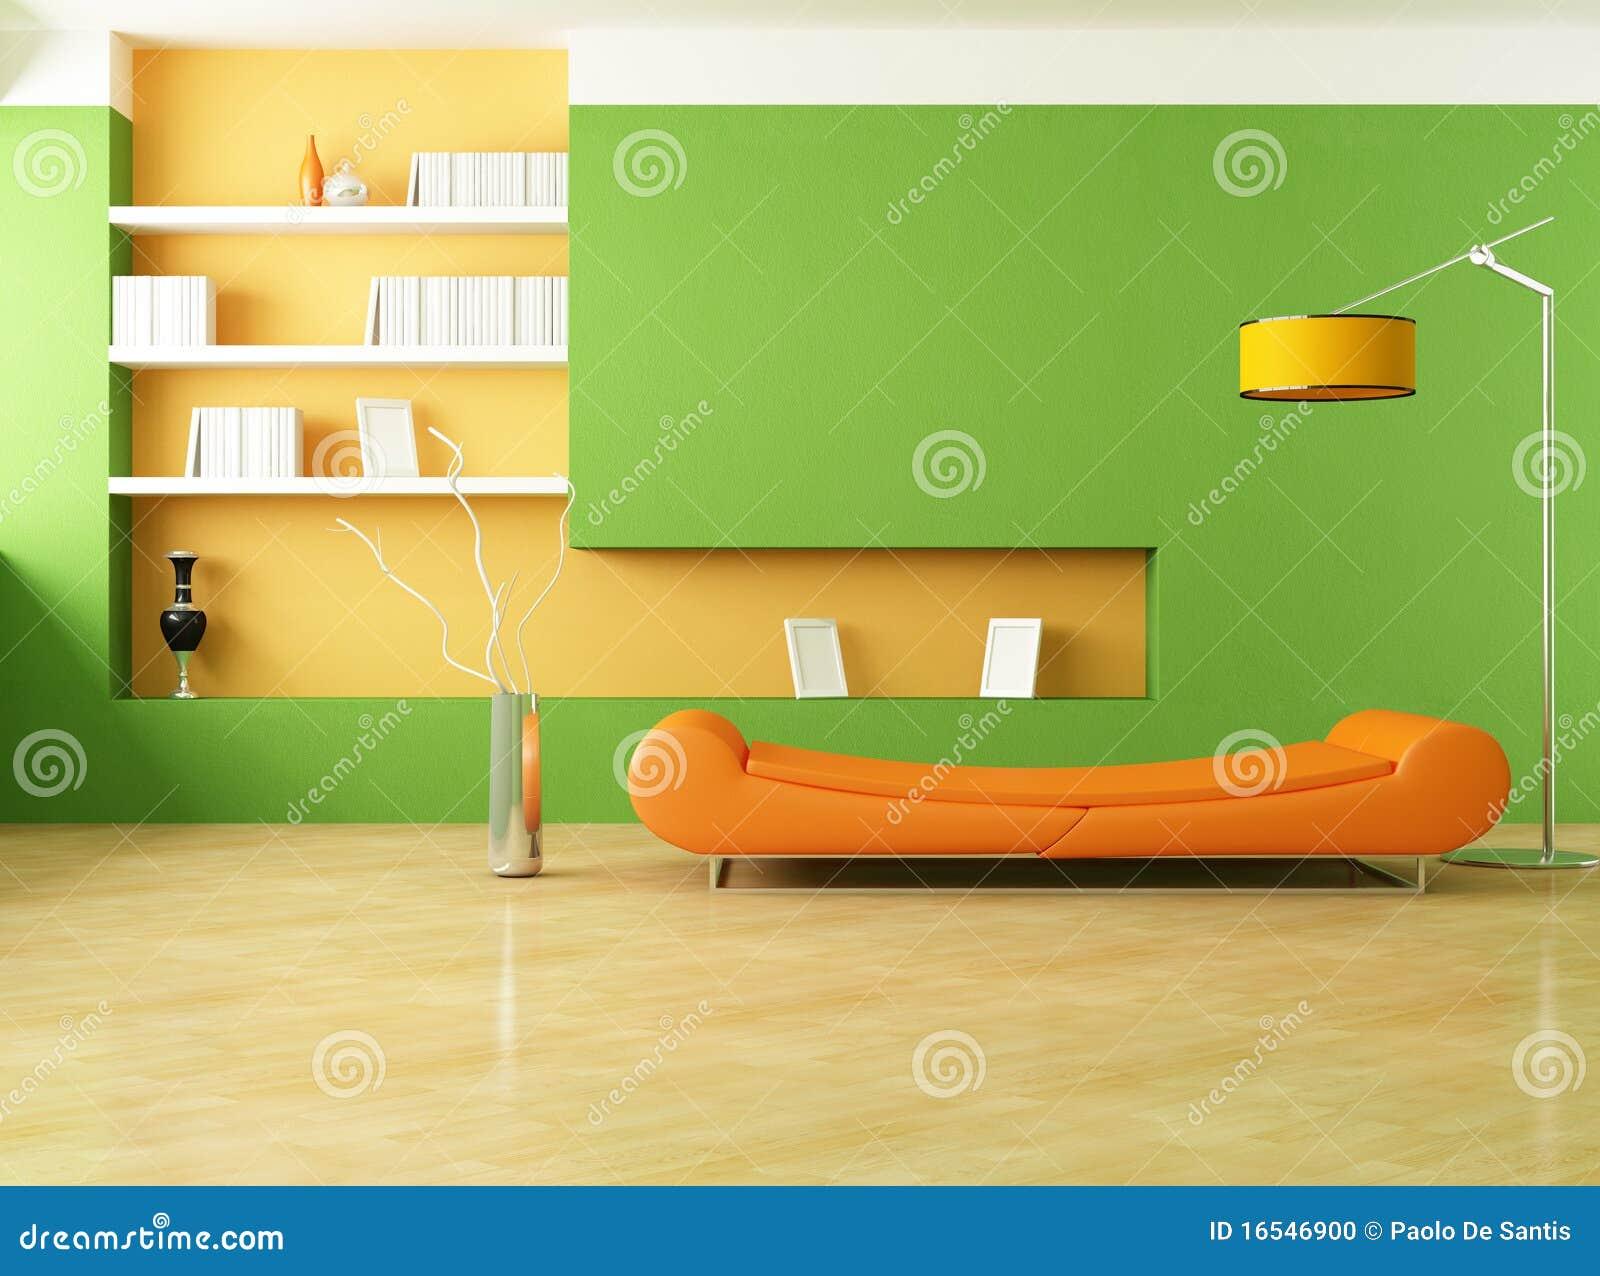 Green and orange lounge stock illustration. Illustration of ...